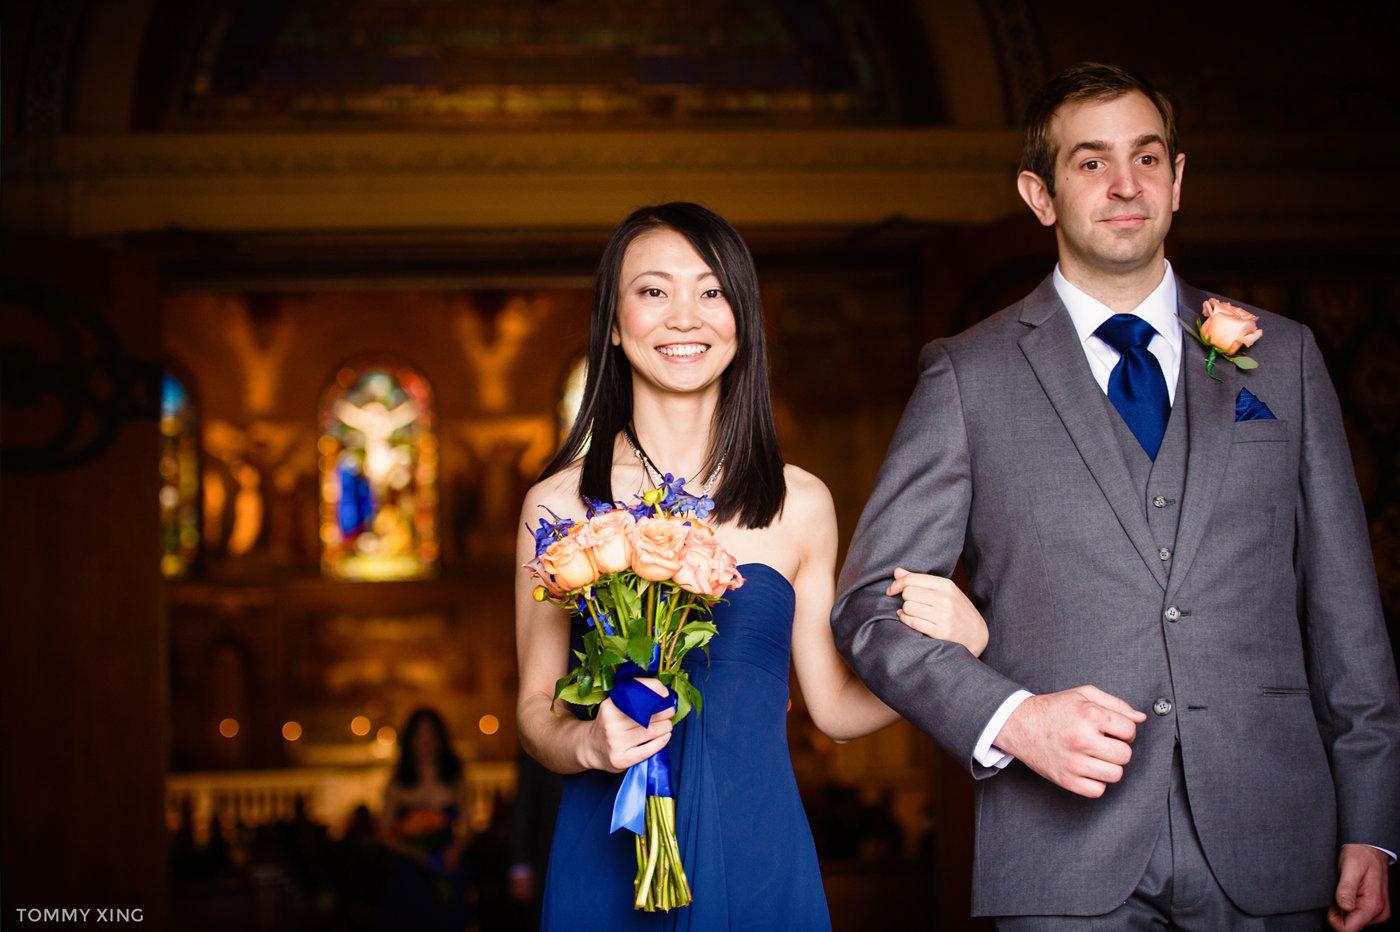 STANFORD MEMORIAL CHURCH WEDDING - Wenjie & Chengcheng - SAN FRANCISCO BAY AREA 斯坦福教堂婚礼跟拍 - 洛杉矶婚礼婚纱照摄影师 Tommy Xing Photography125.jpg